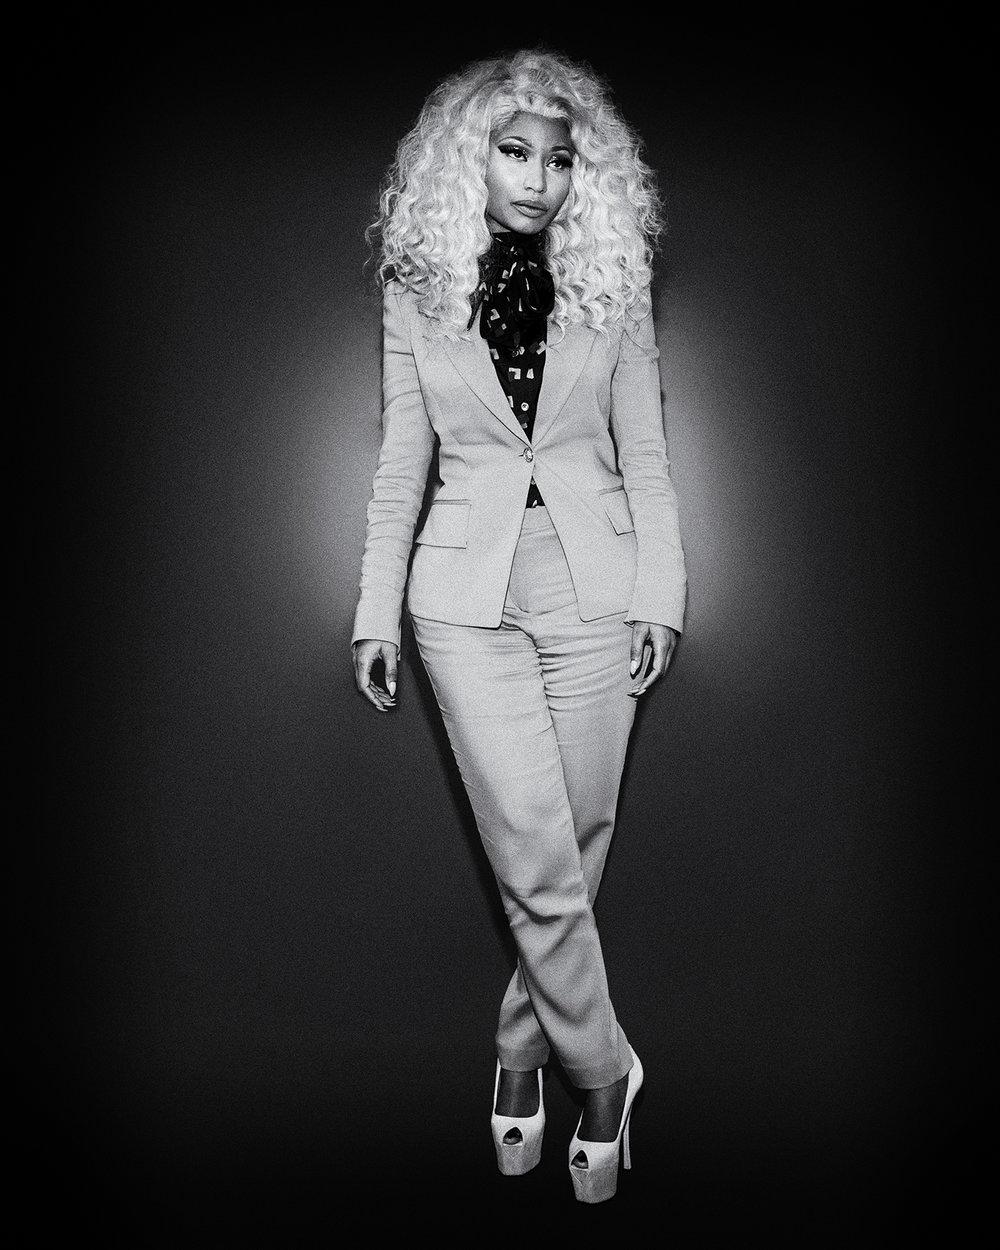 20121120_Macys_Nicki_Minaj_0092_BW.jpg